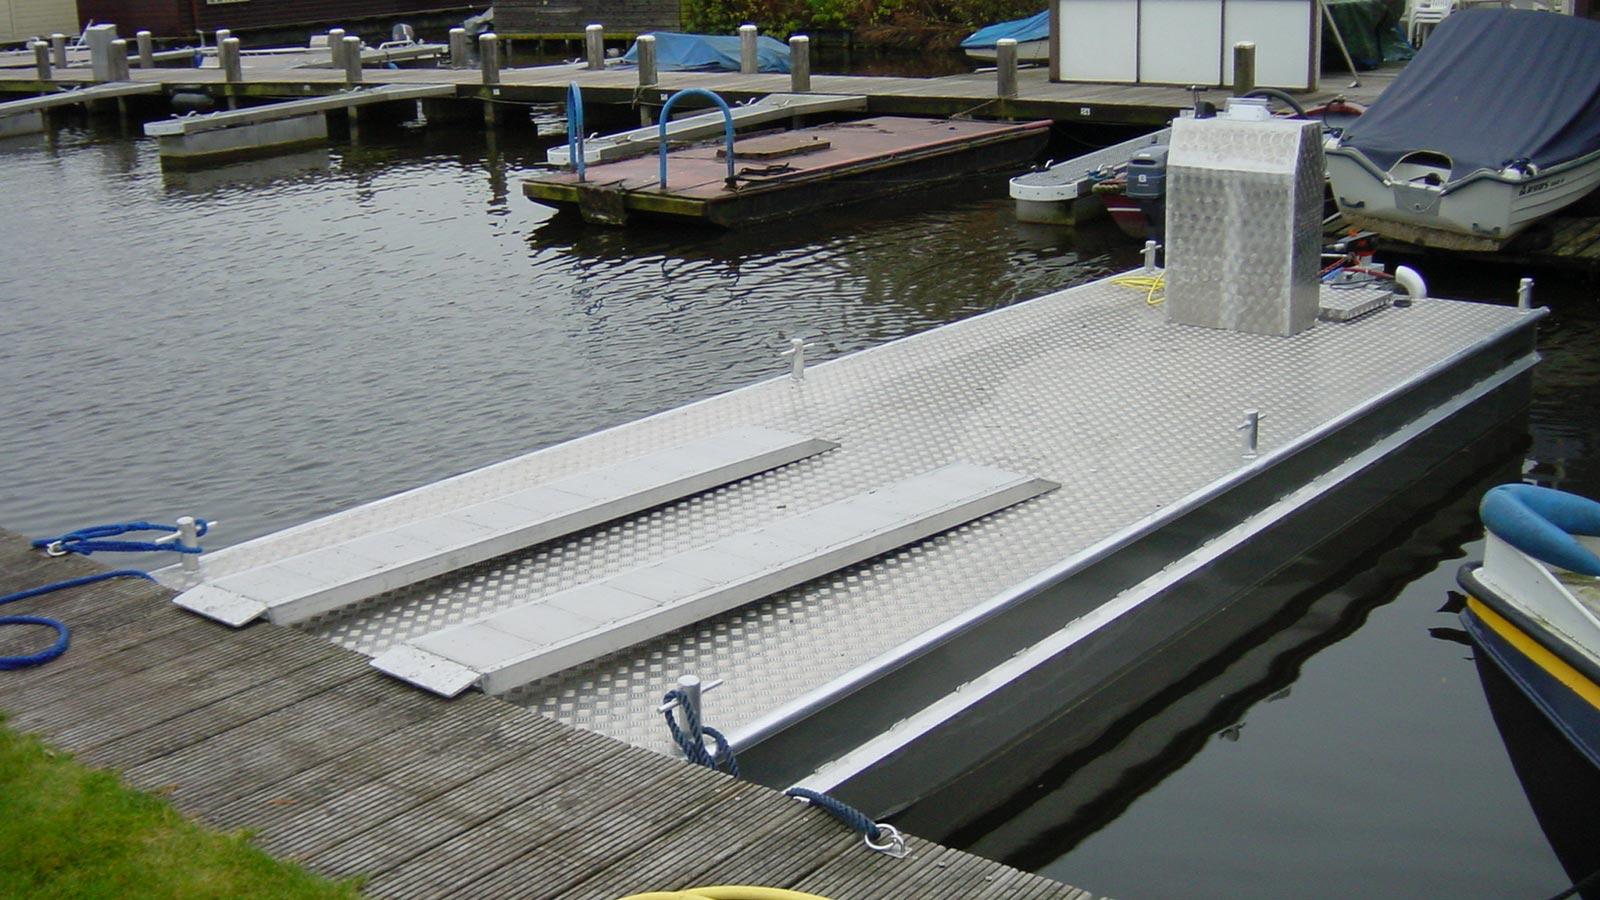 AluminiumJon.nl - Ponton 6 meter - Werkpontons van 3, 4, 6, 8 en 14 meter van aluminium.